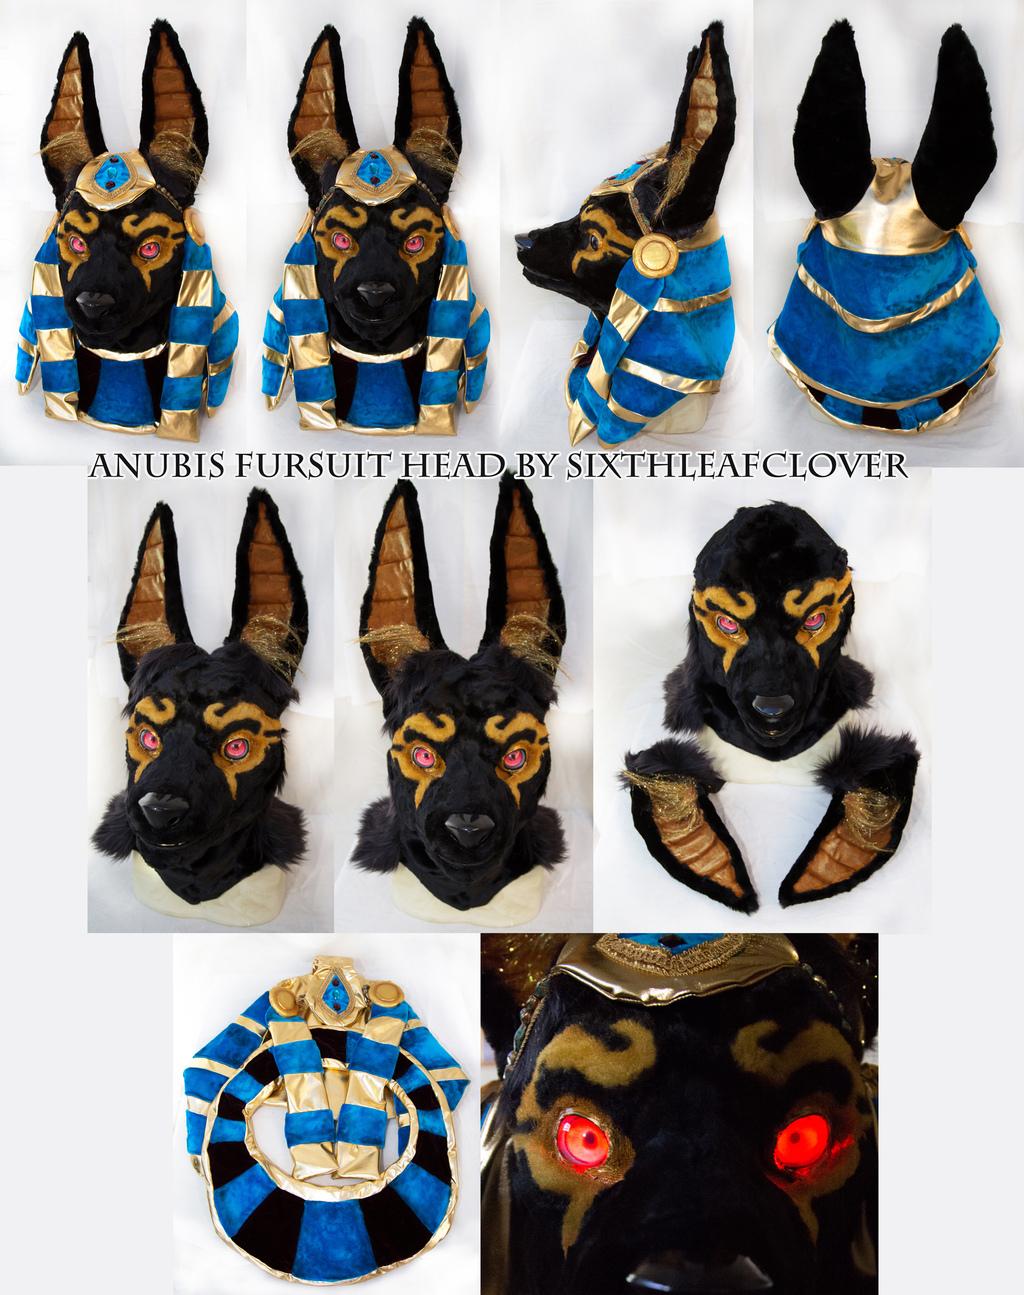 Most recent image: Egyptian Anubis Fursuit Head for sale